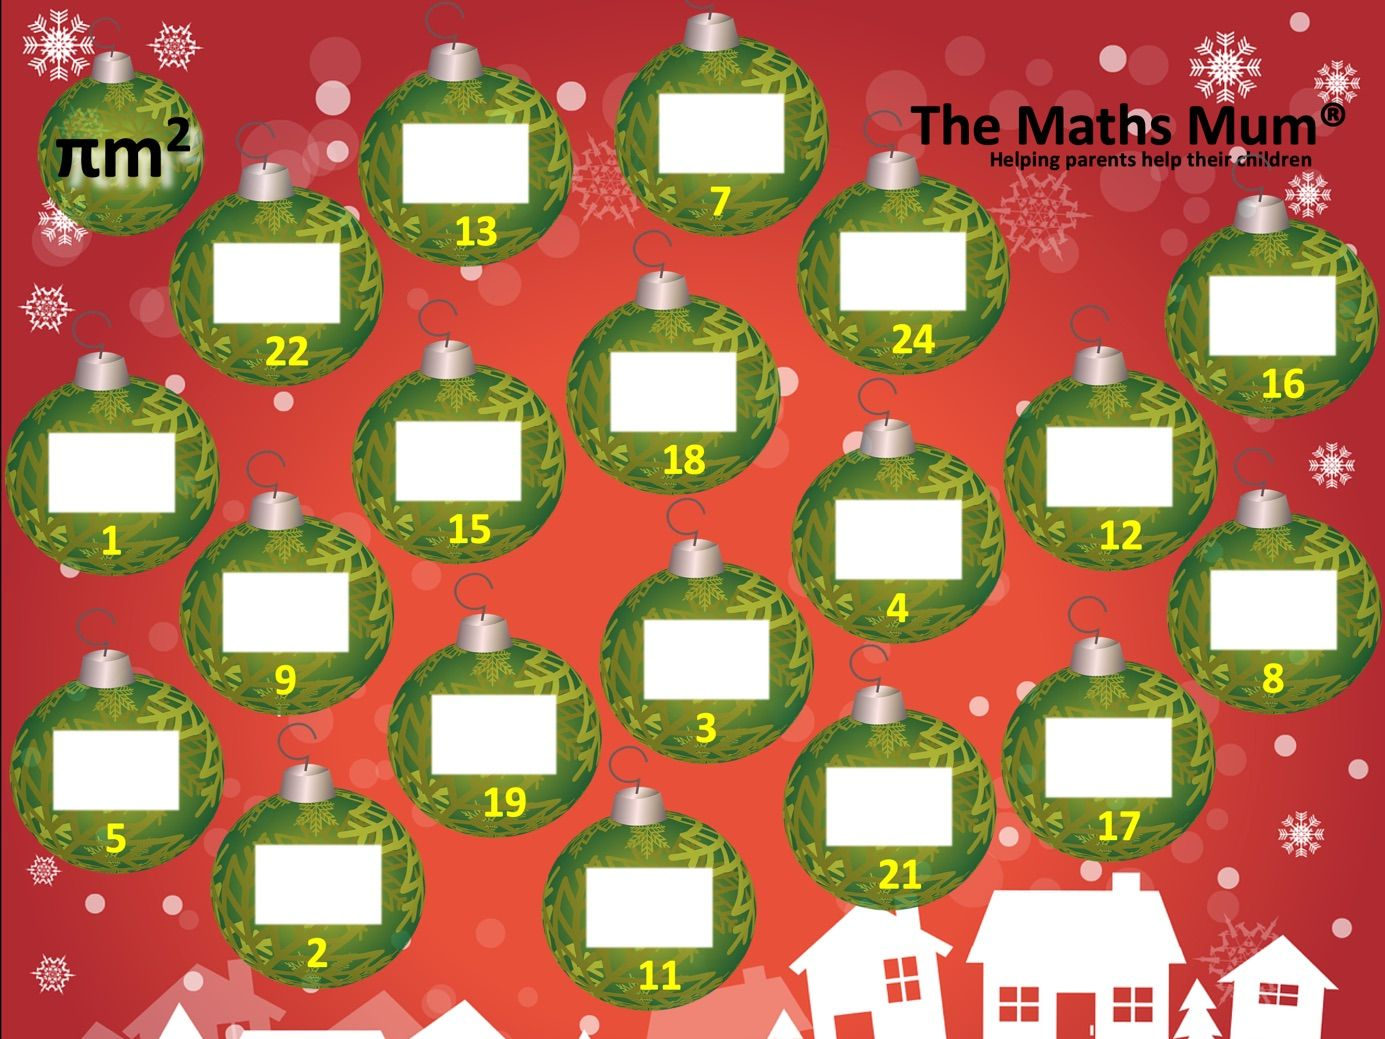 Alternative MATHS Advent Calendars